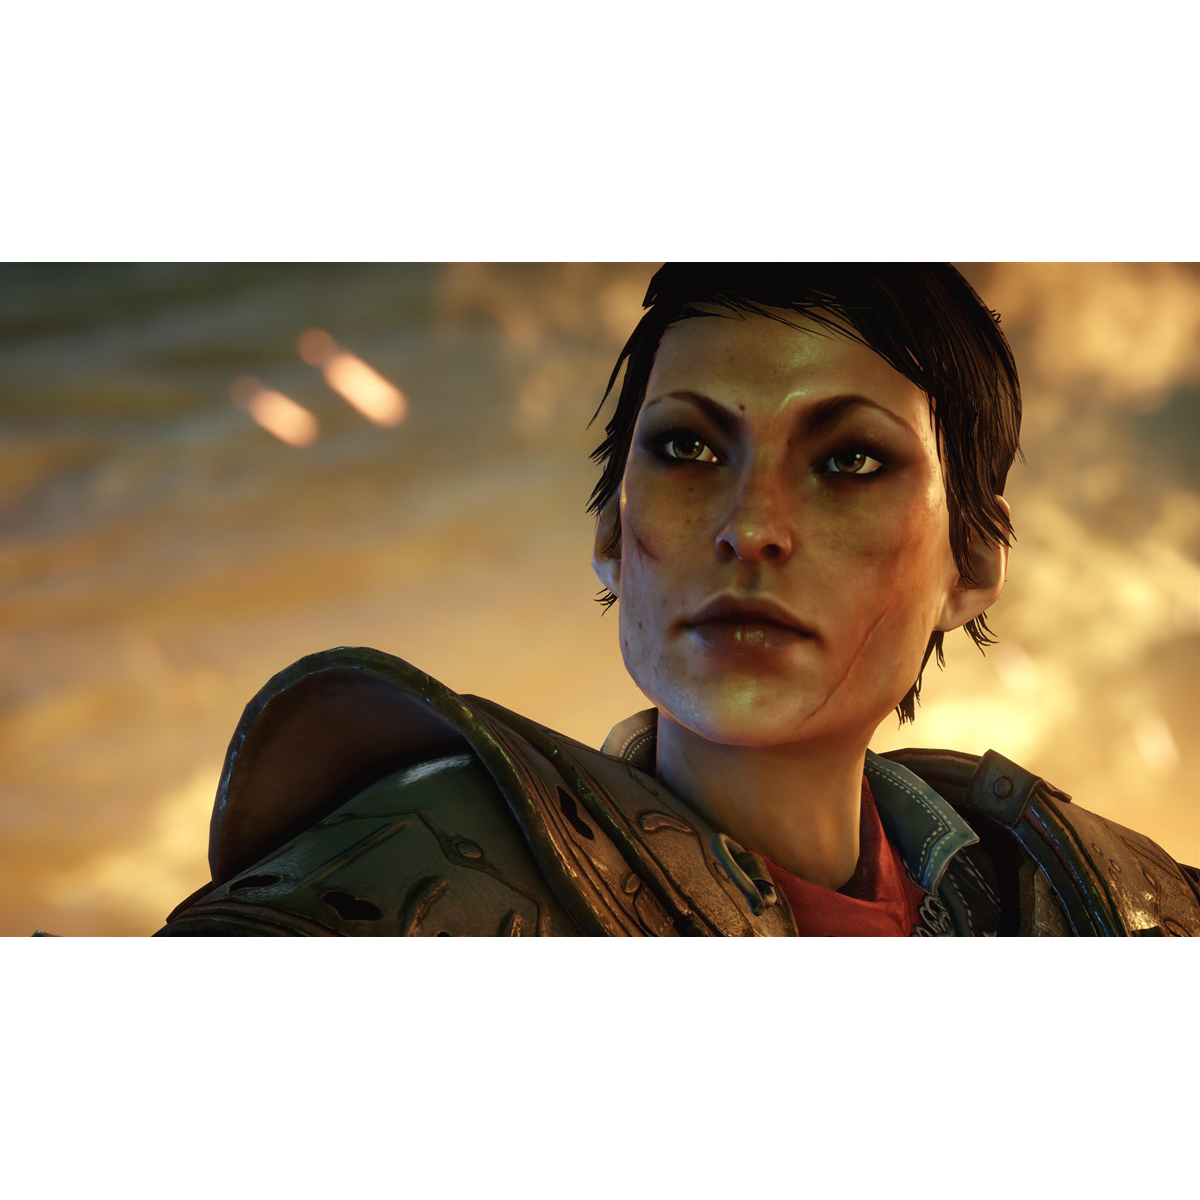 Joc Dragon Age: Inquisition pentru PlayStation 3 6